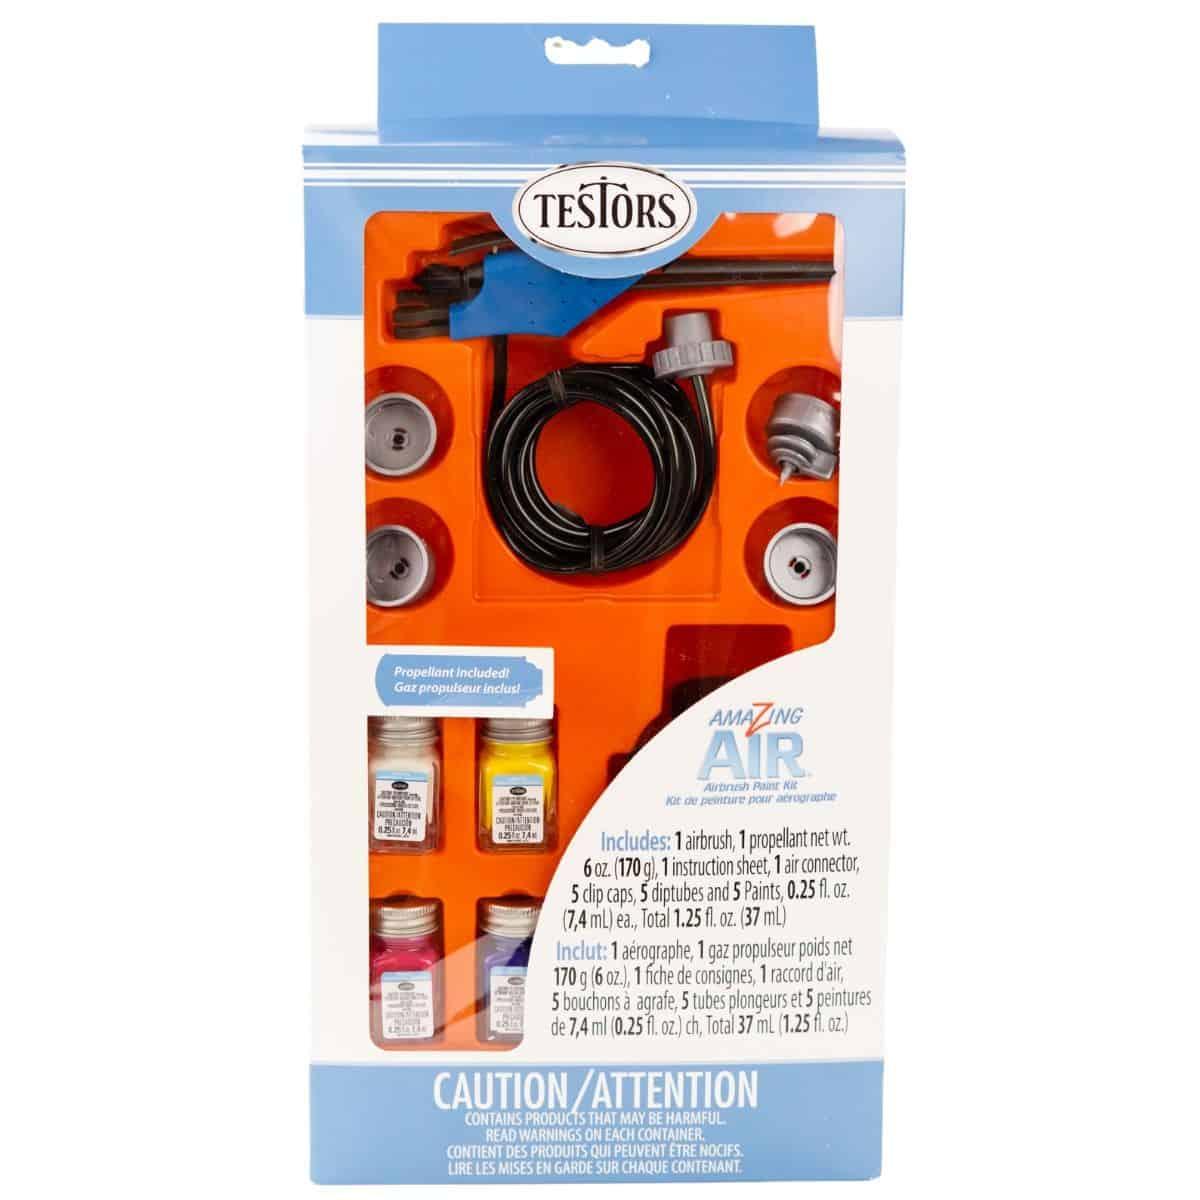 Testors Amazing Air Airbrush